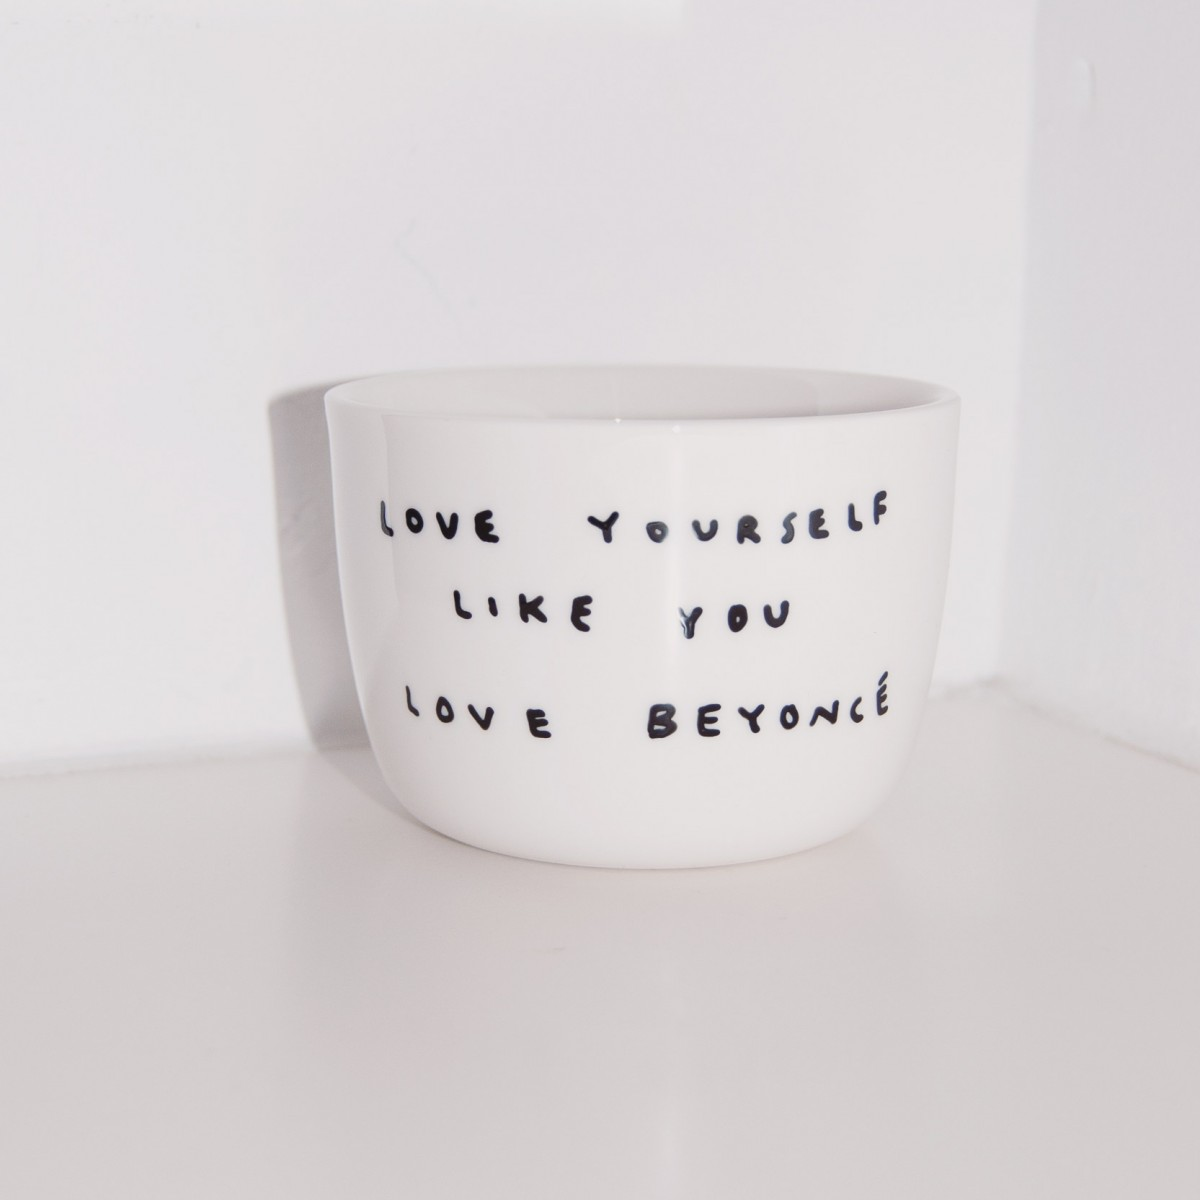 LOVE YOURSELF LIKE YOU LOVE BEYONCÉ Becher SMALL – Johanna Schwarzer